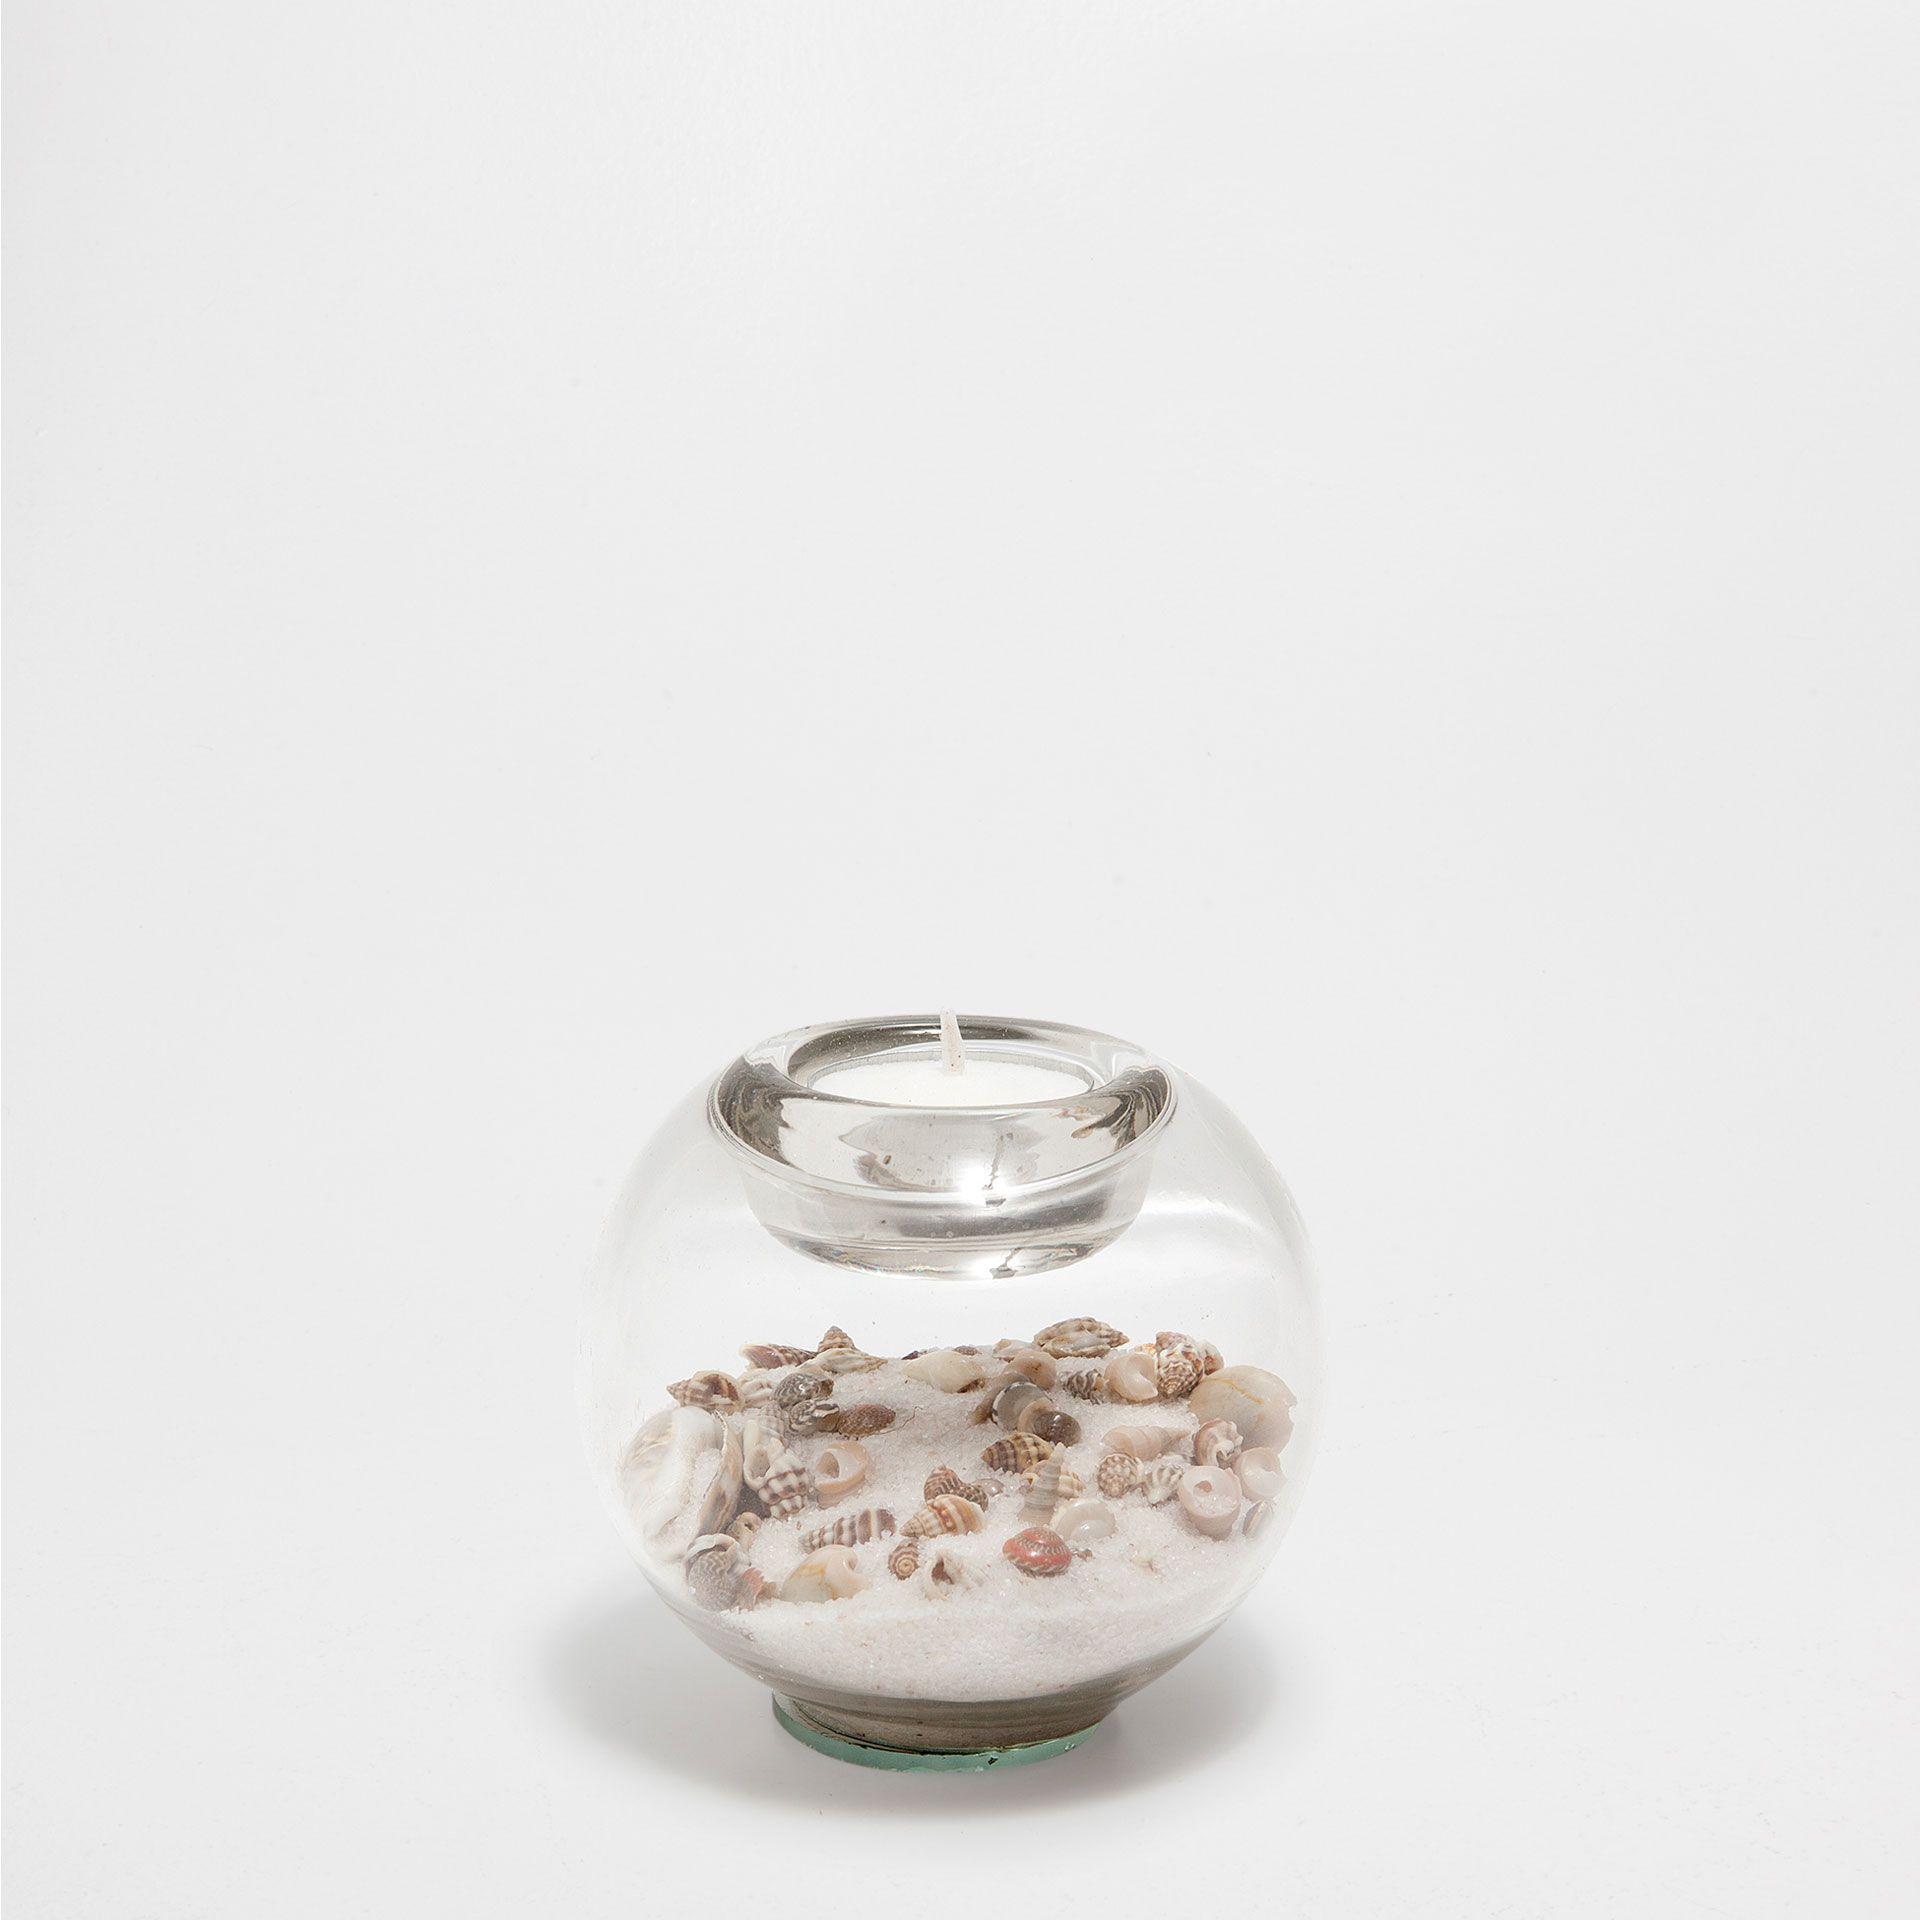 Porte bougie verre coquillages et sable zara home - Porte bougie en verre ...